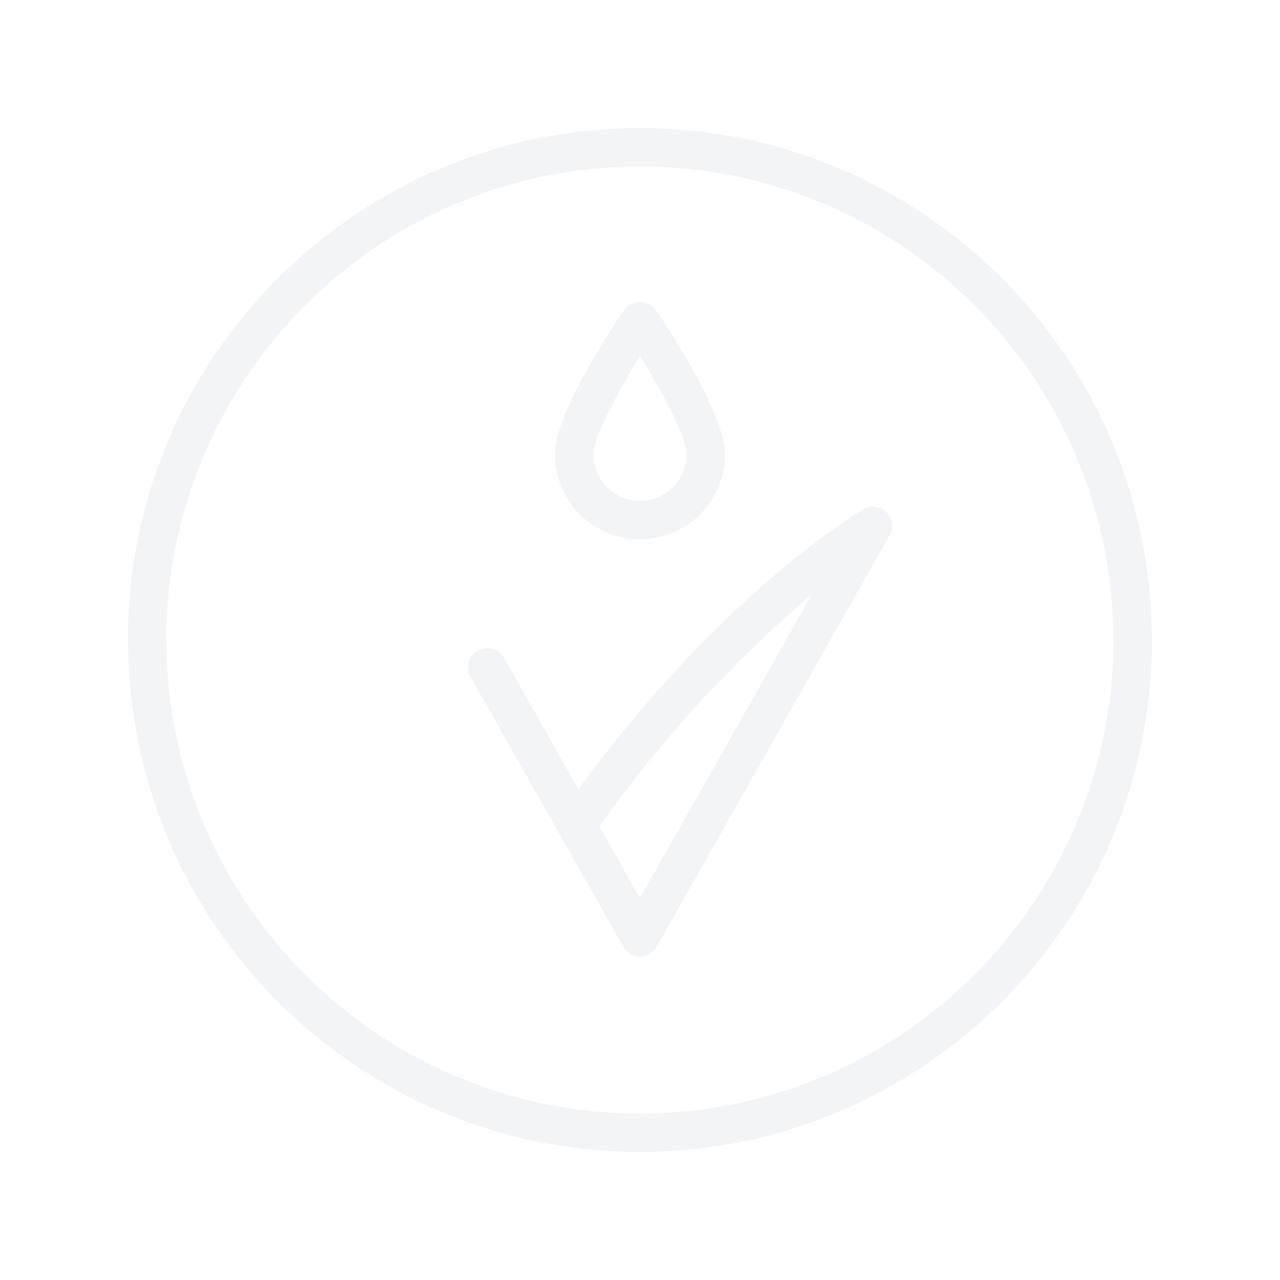 ELIZABETH ARDEN Ceramide Lift And Firm Eye Cream SPF15 15ml